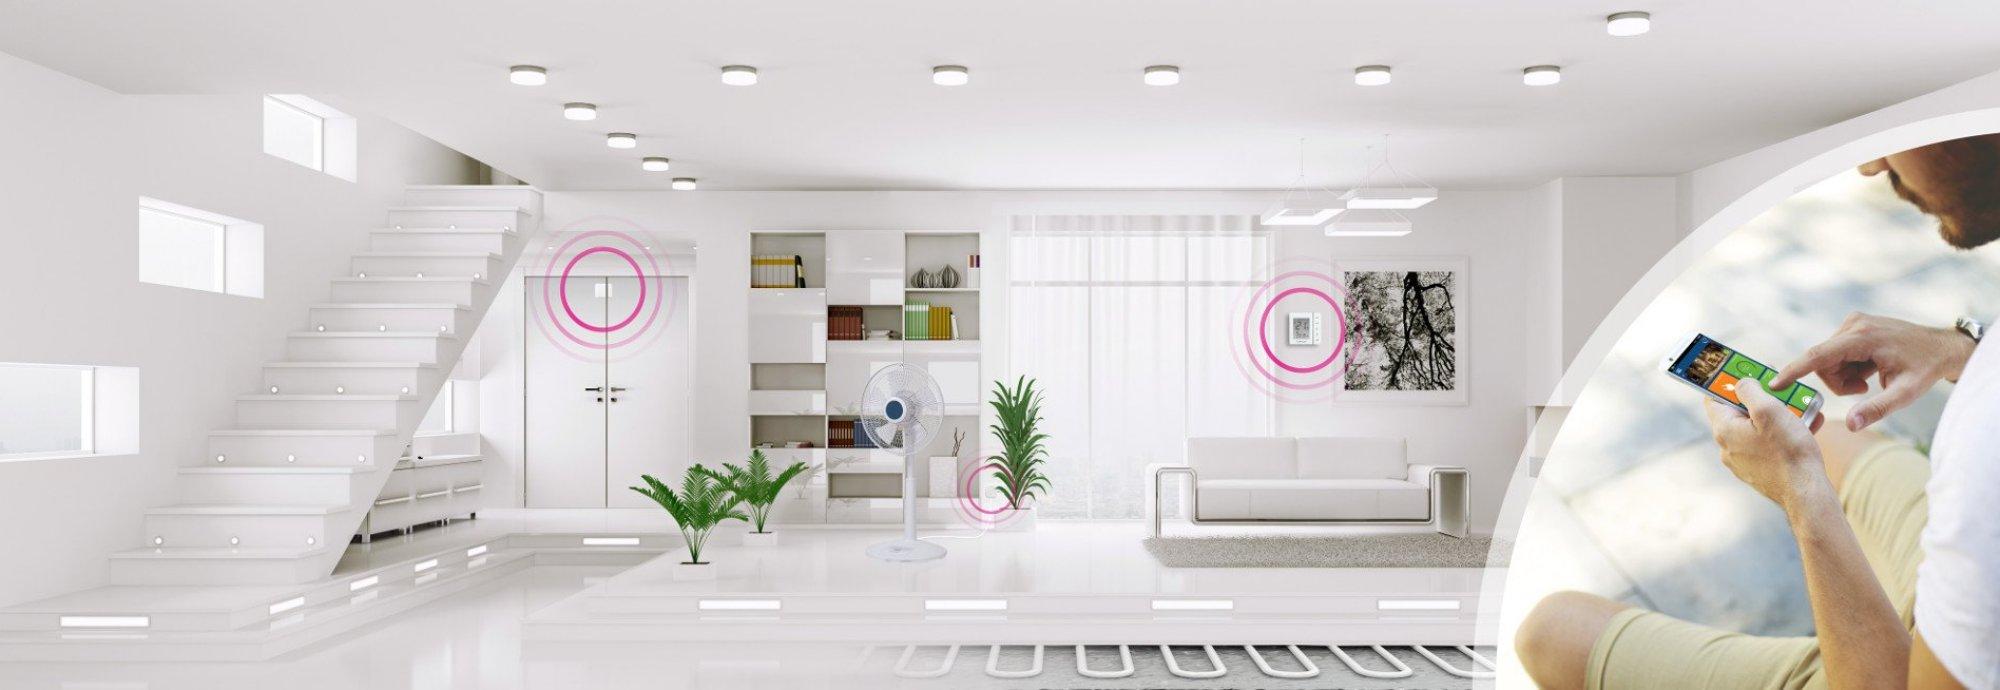 salus it600 smart home